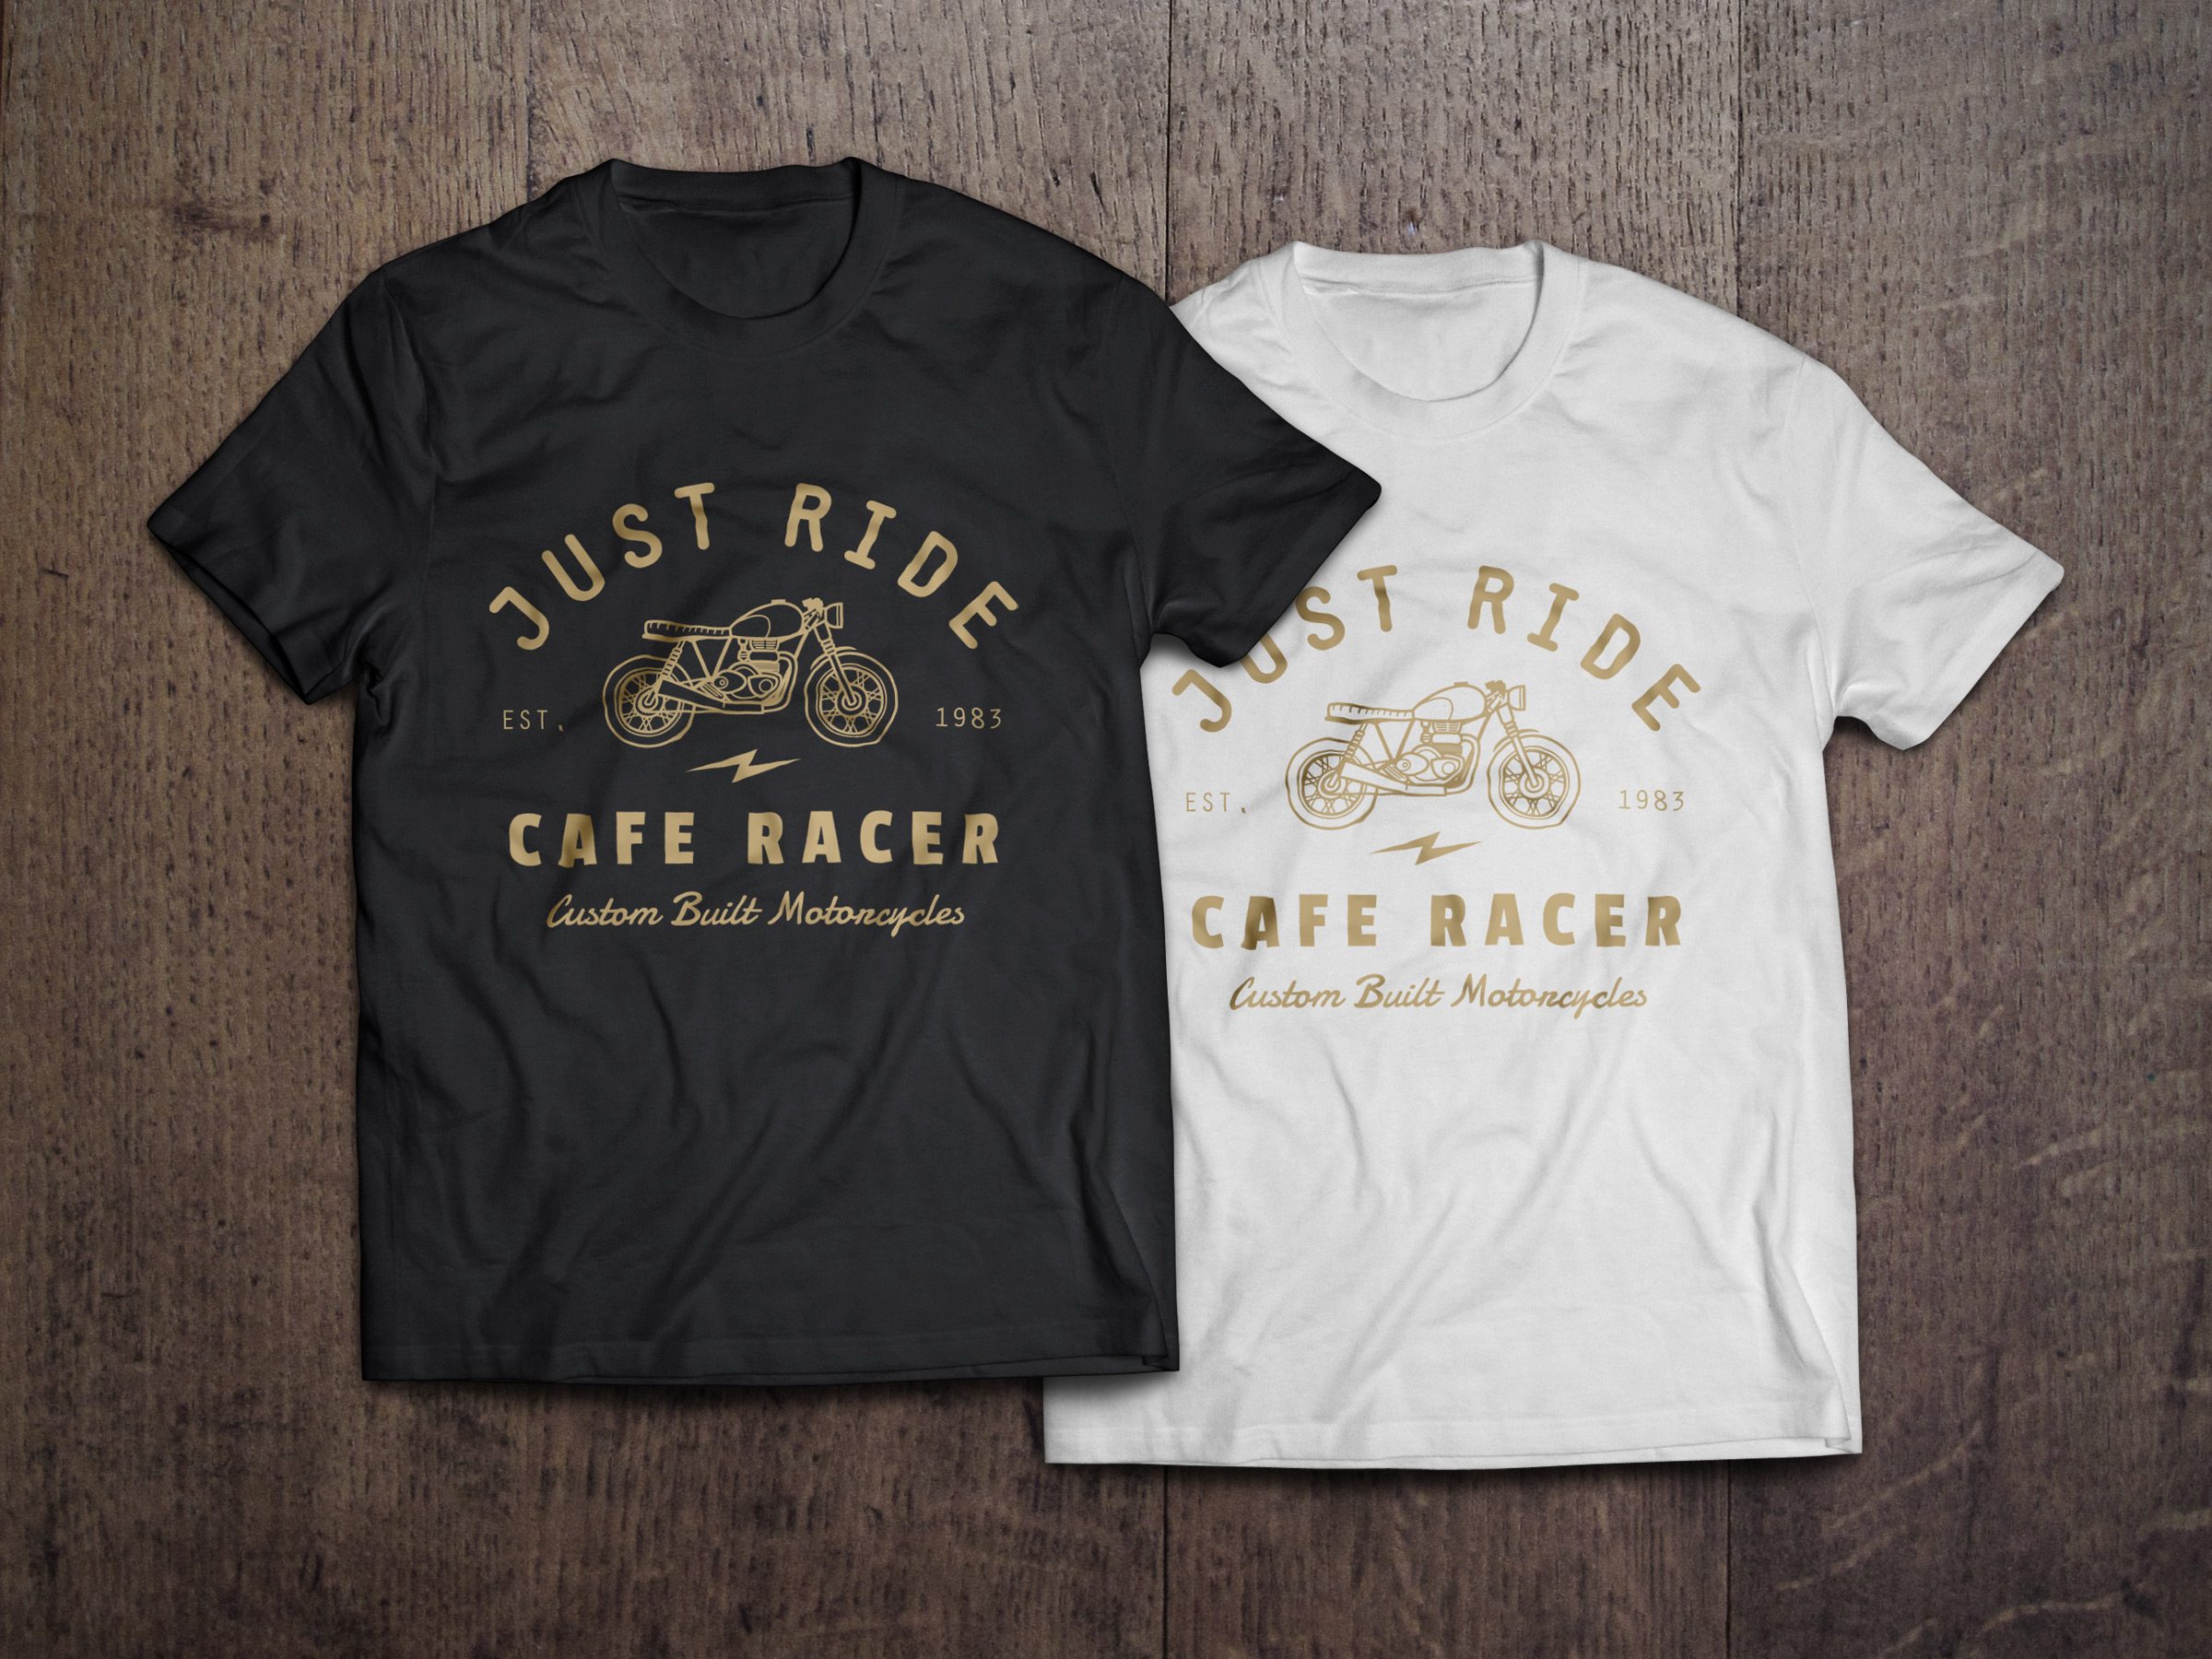 16 Free Psd T-Shirt Mockup Images